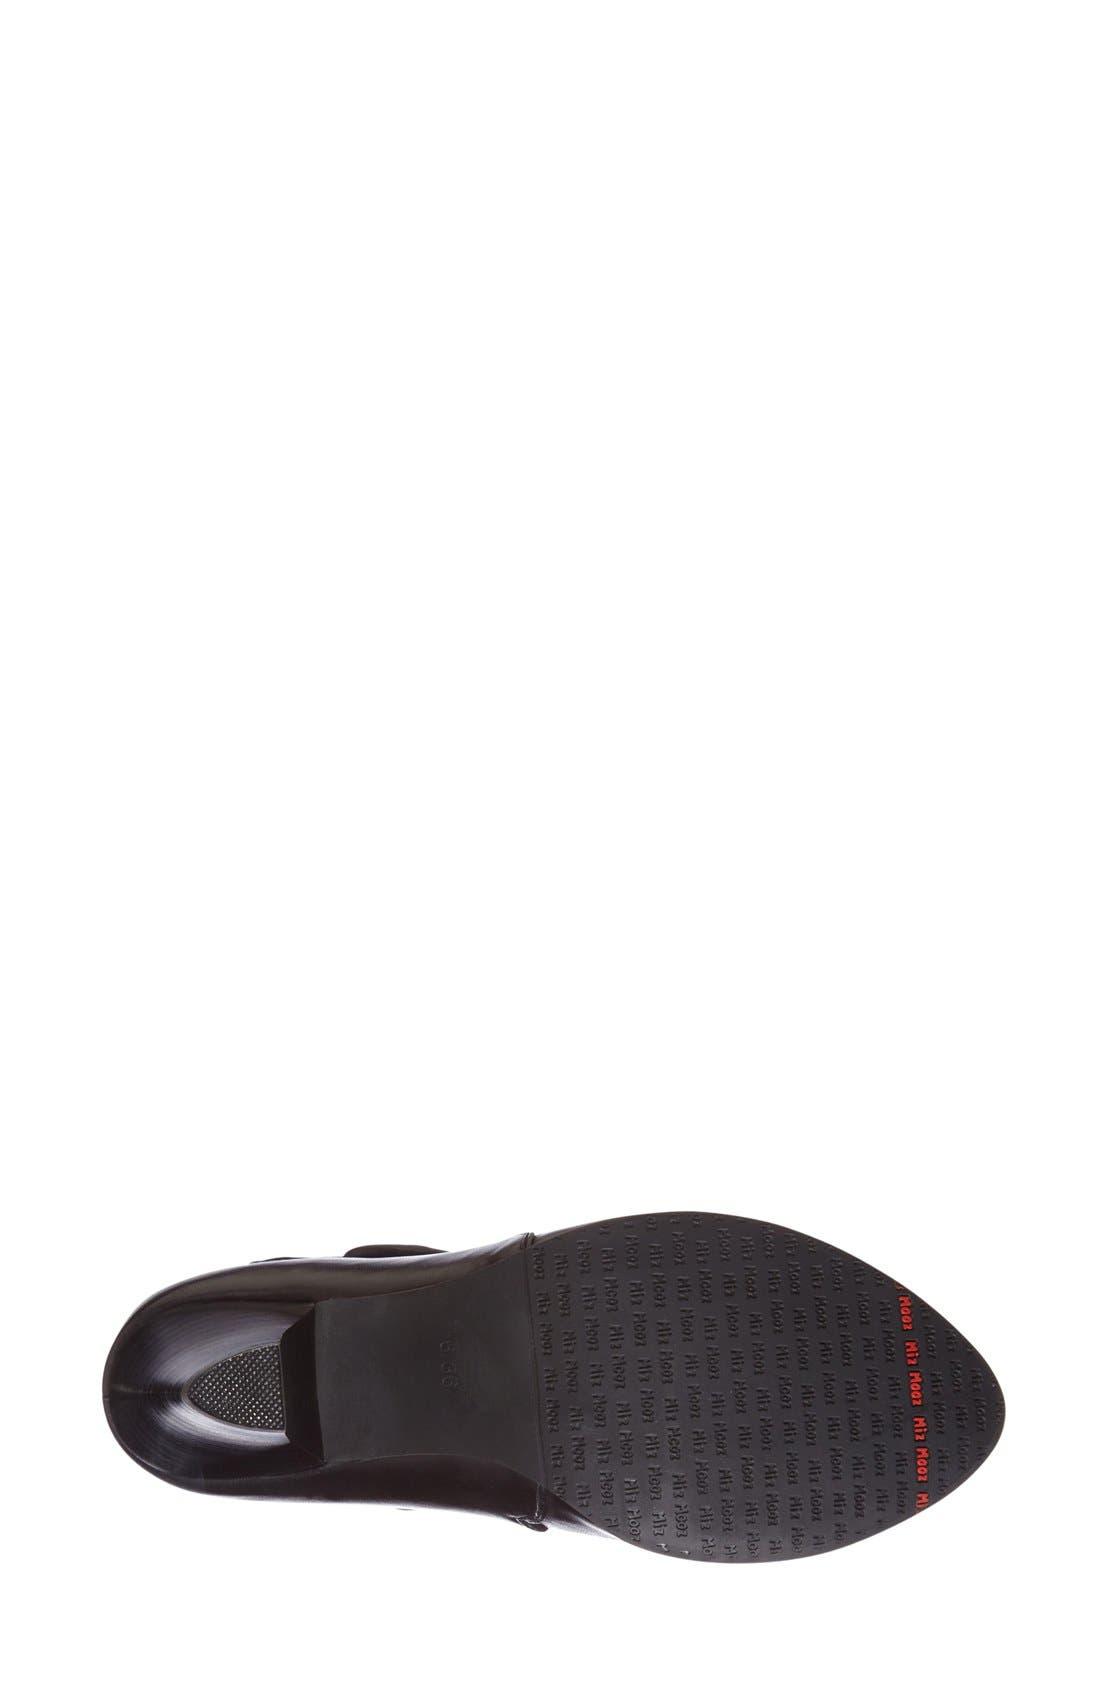 Footwear 'Carissa' Mary Jane Pump,                             Alternate thumbnail 4, color,                             001